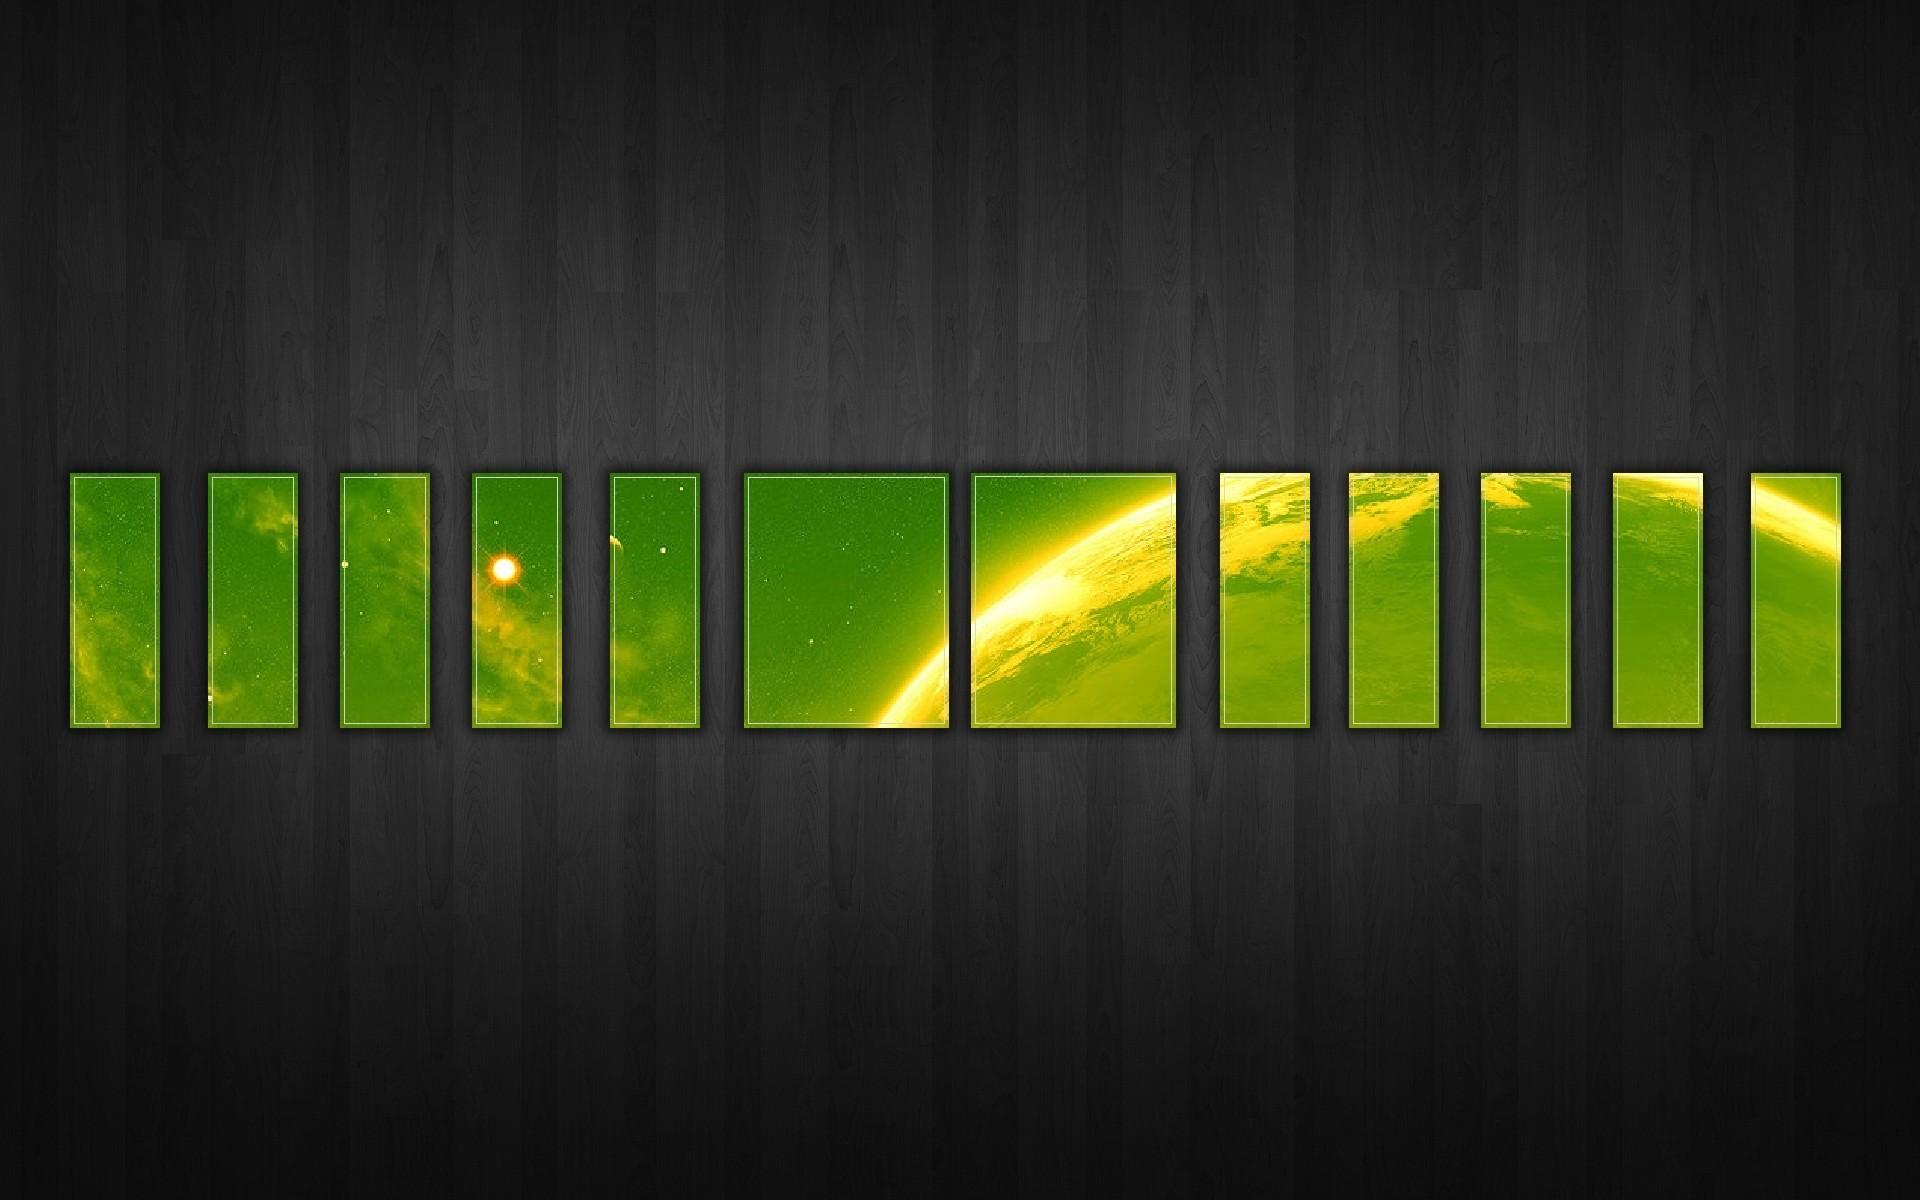 Wallpaper surface, green, black, gray